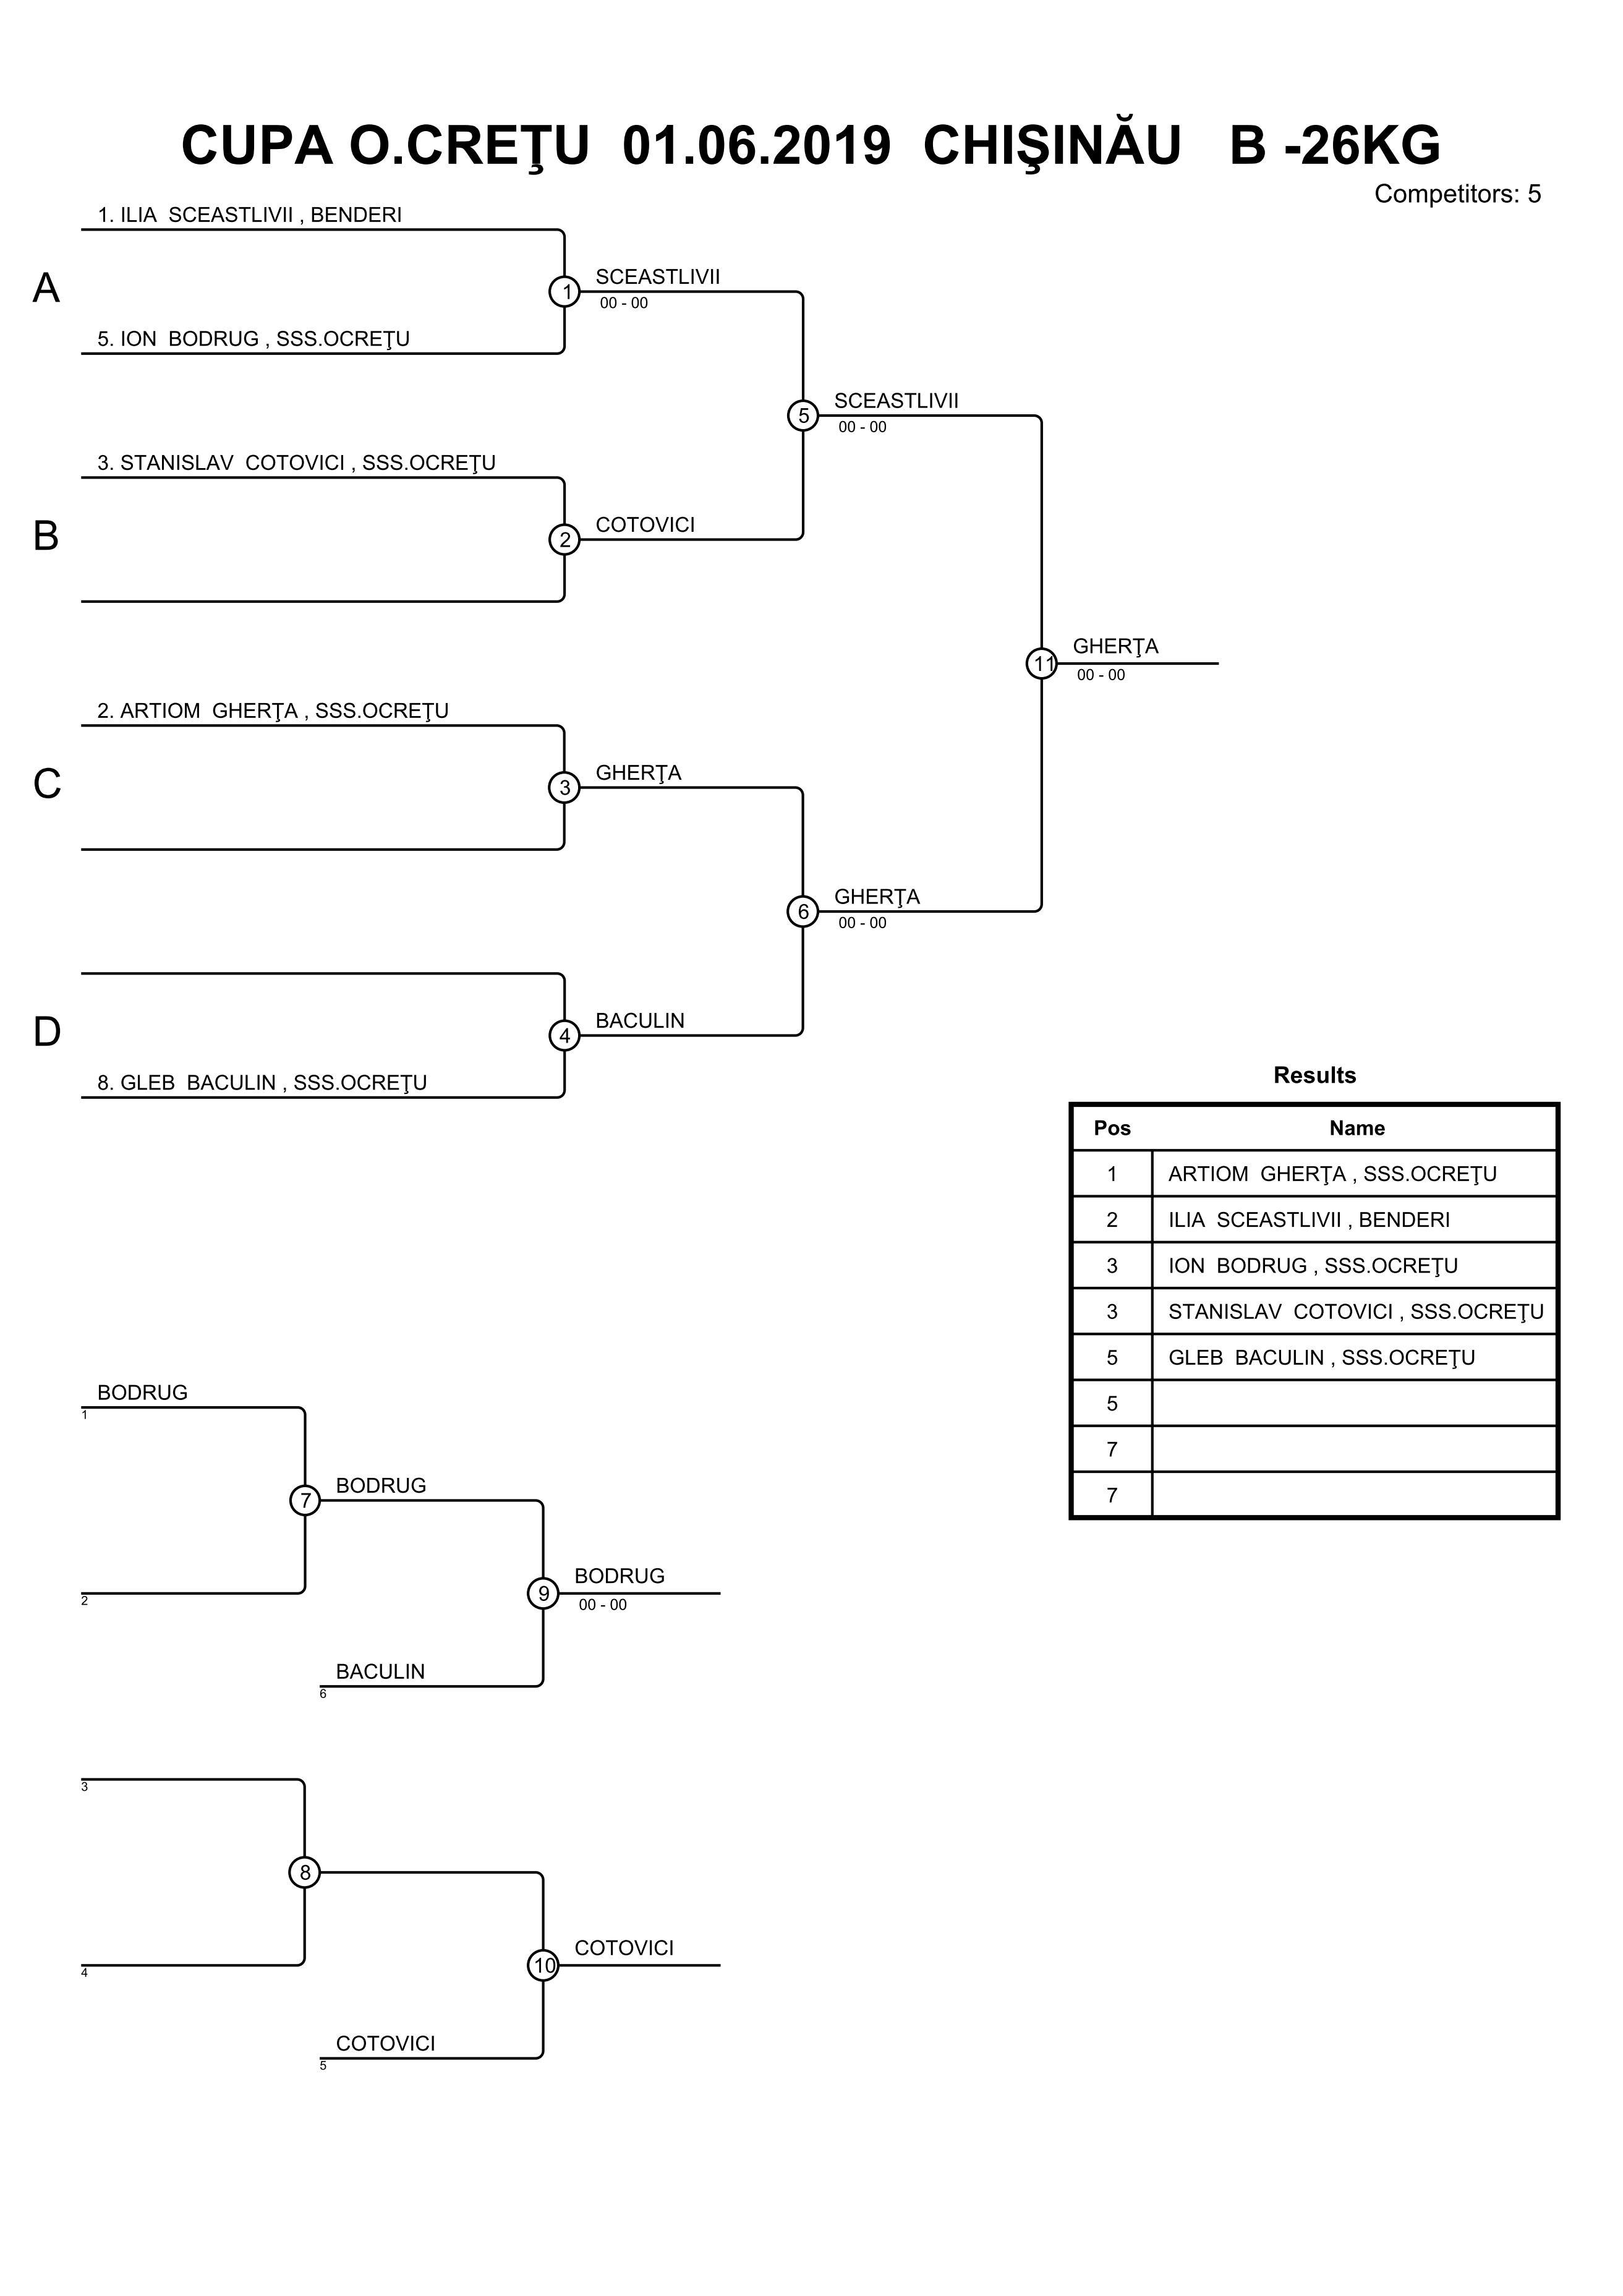 Judo 2019 * PROTOCOL * Cupa O.Cretu (01.06.2019)